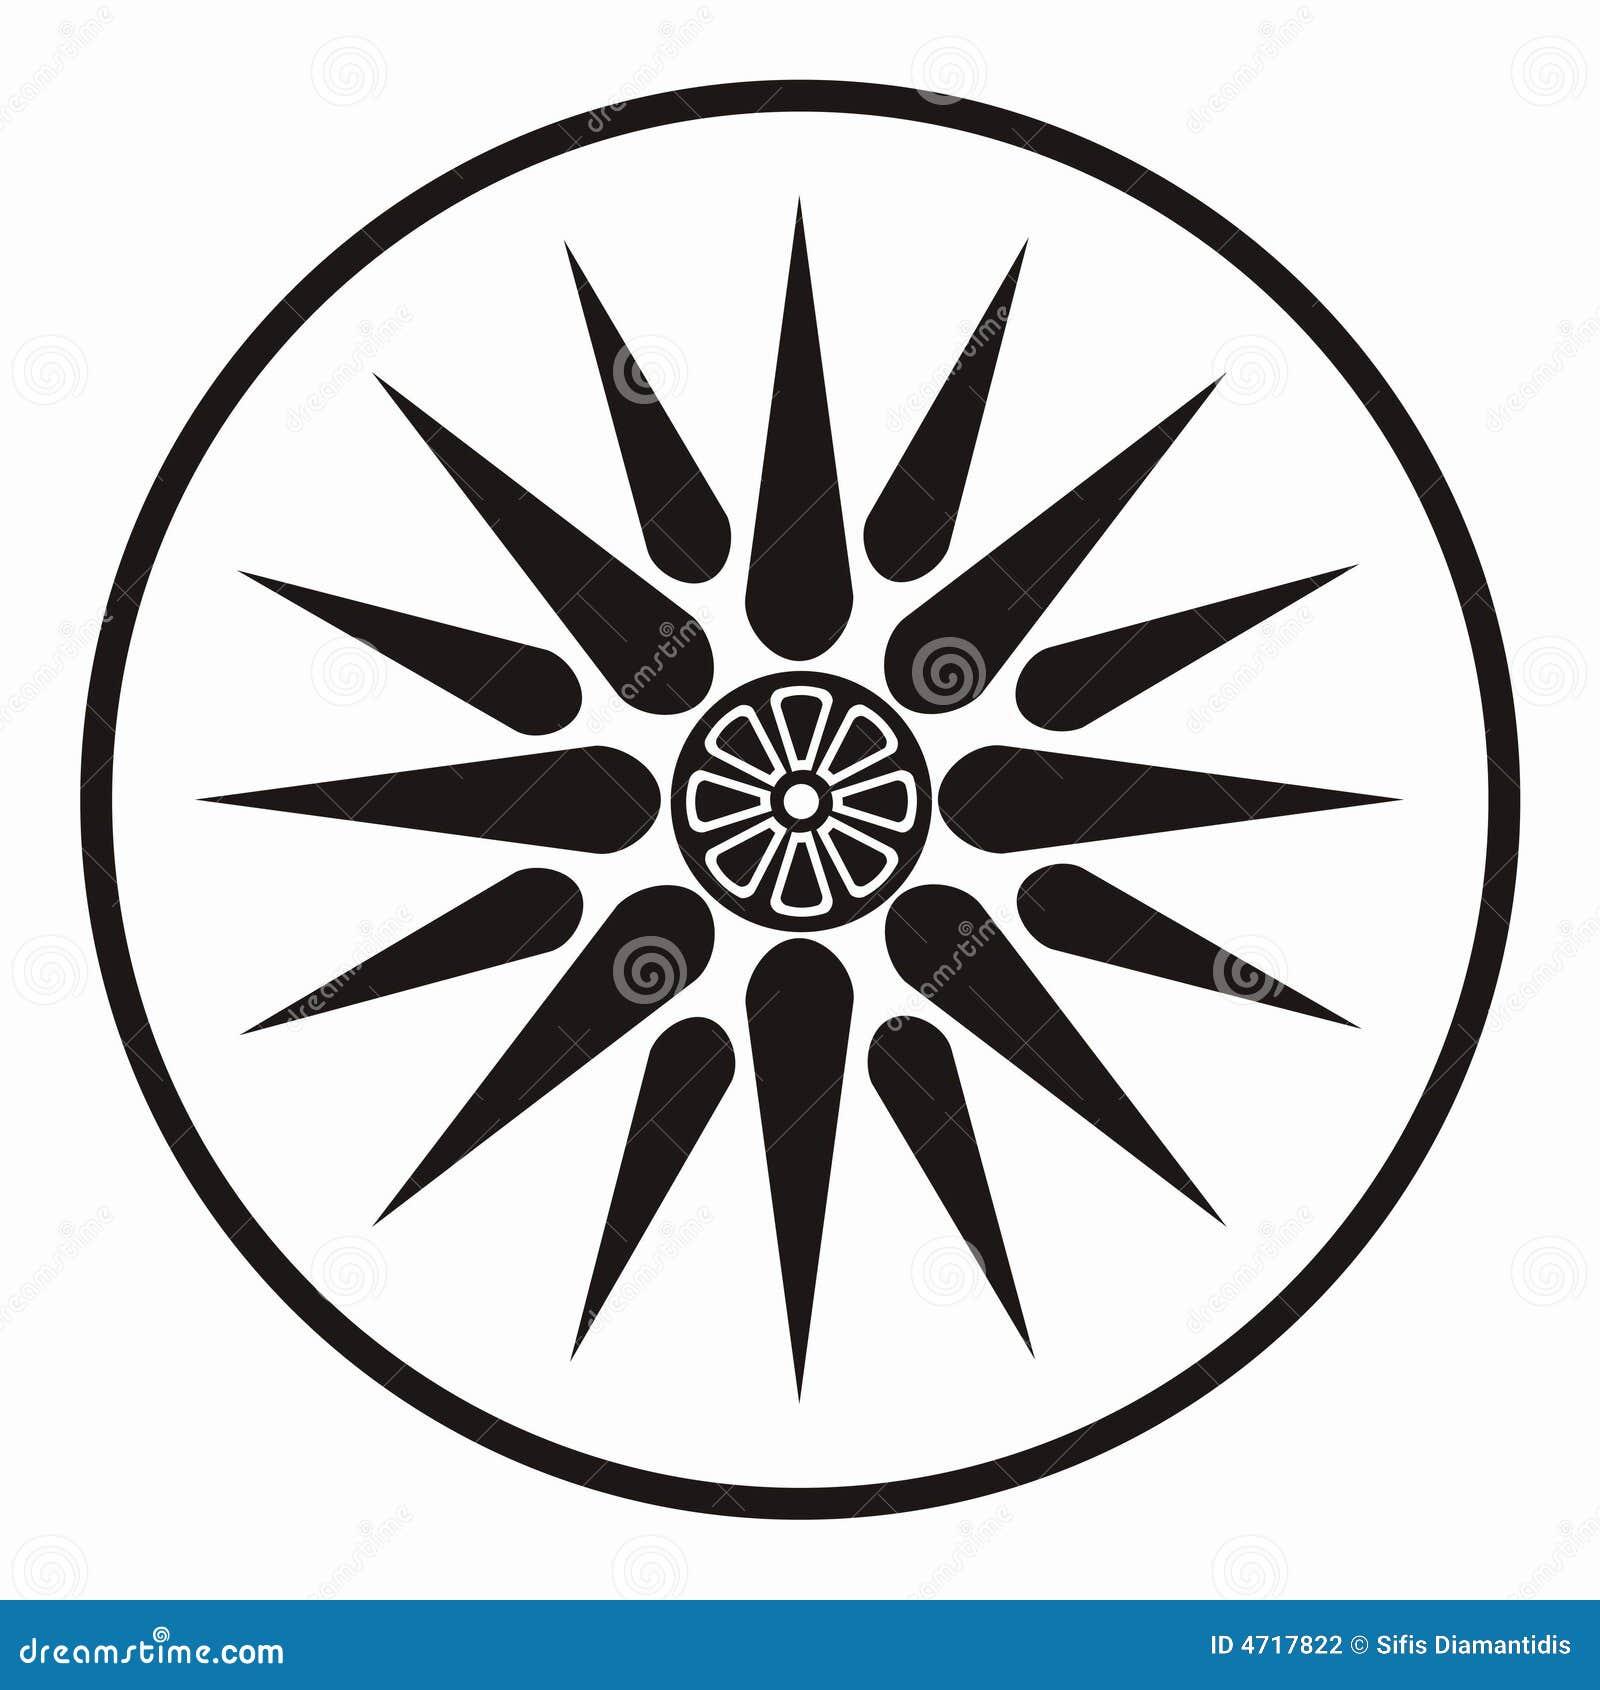 Czeshop Images Ancient Greek Symbols For Strength